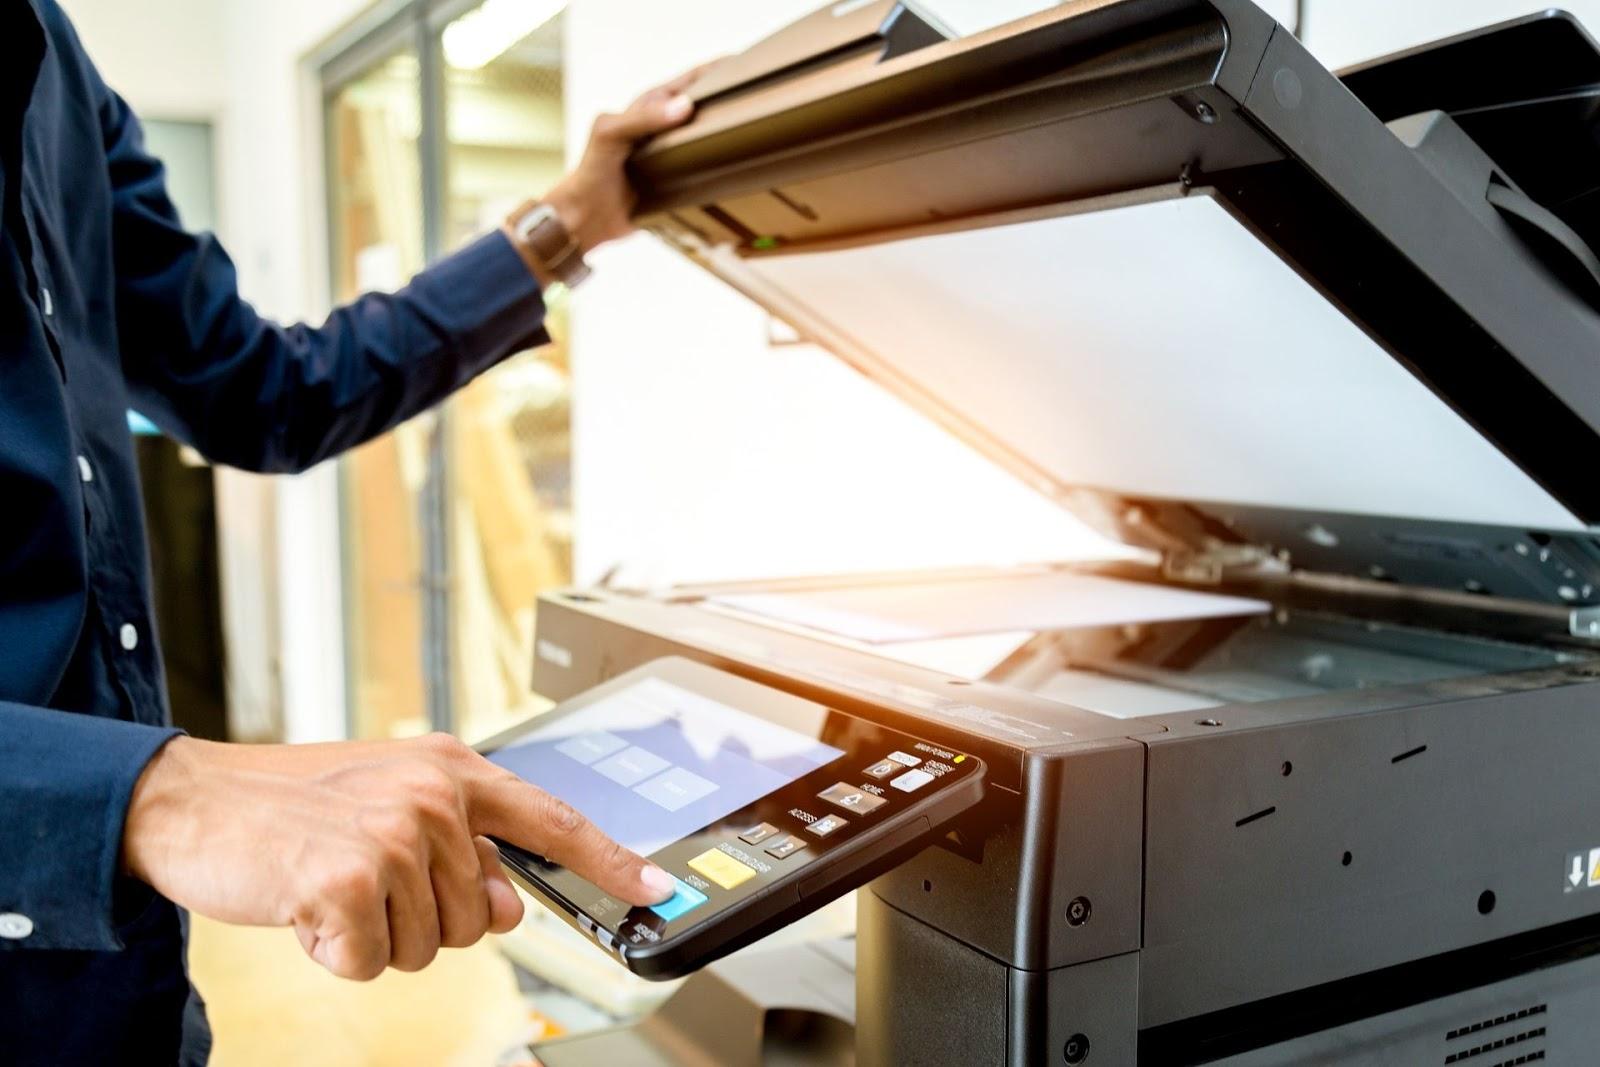 A person using a copier machine